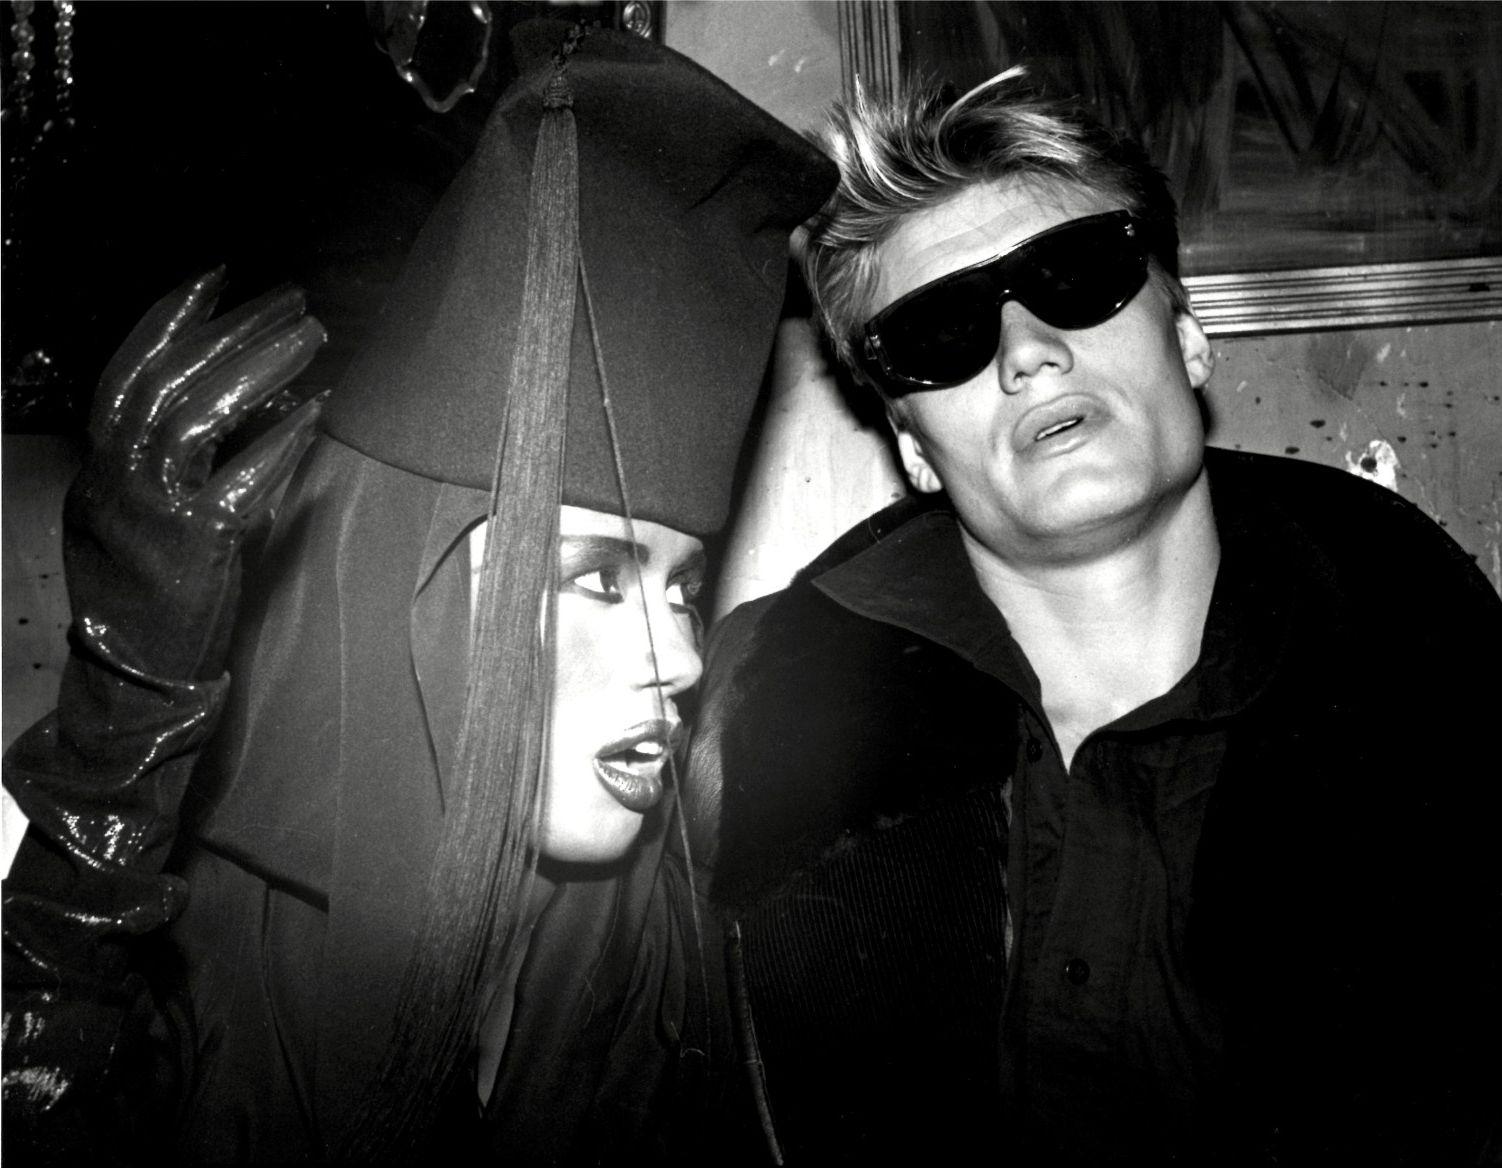 Grace Jones & Dolph Lundgren at The Palladium, NYC